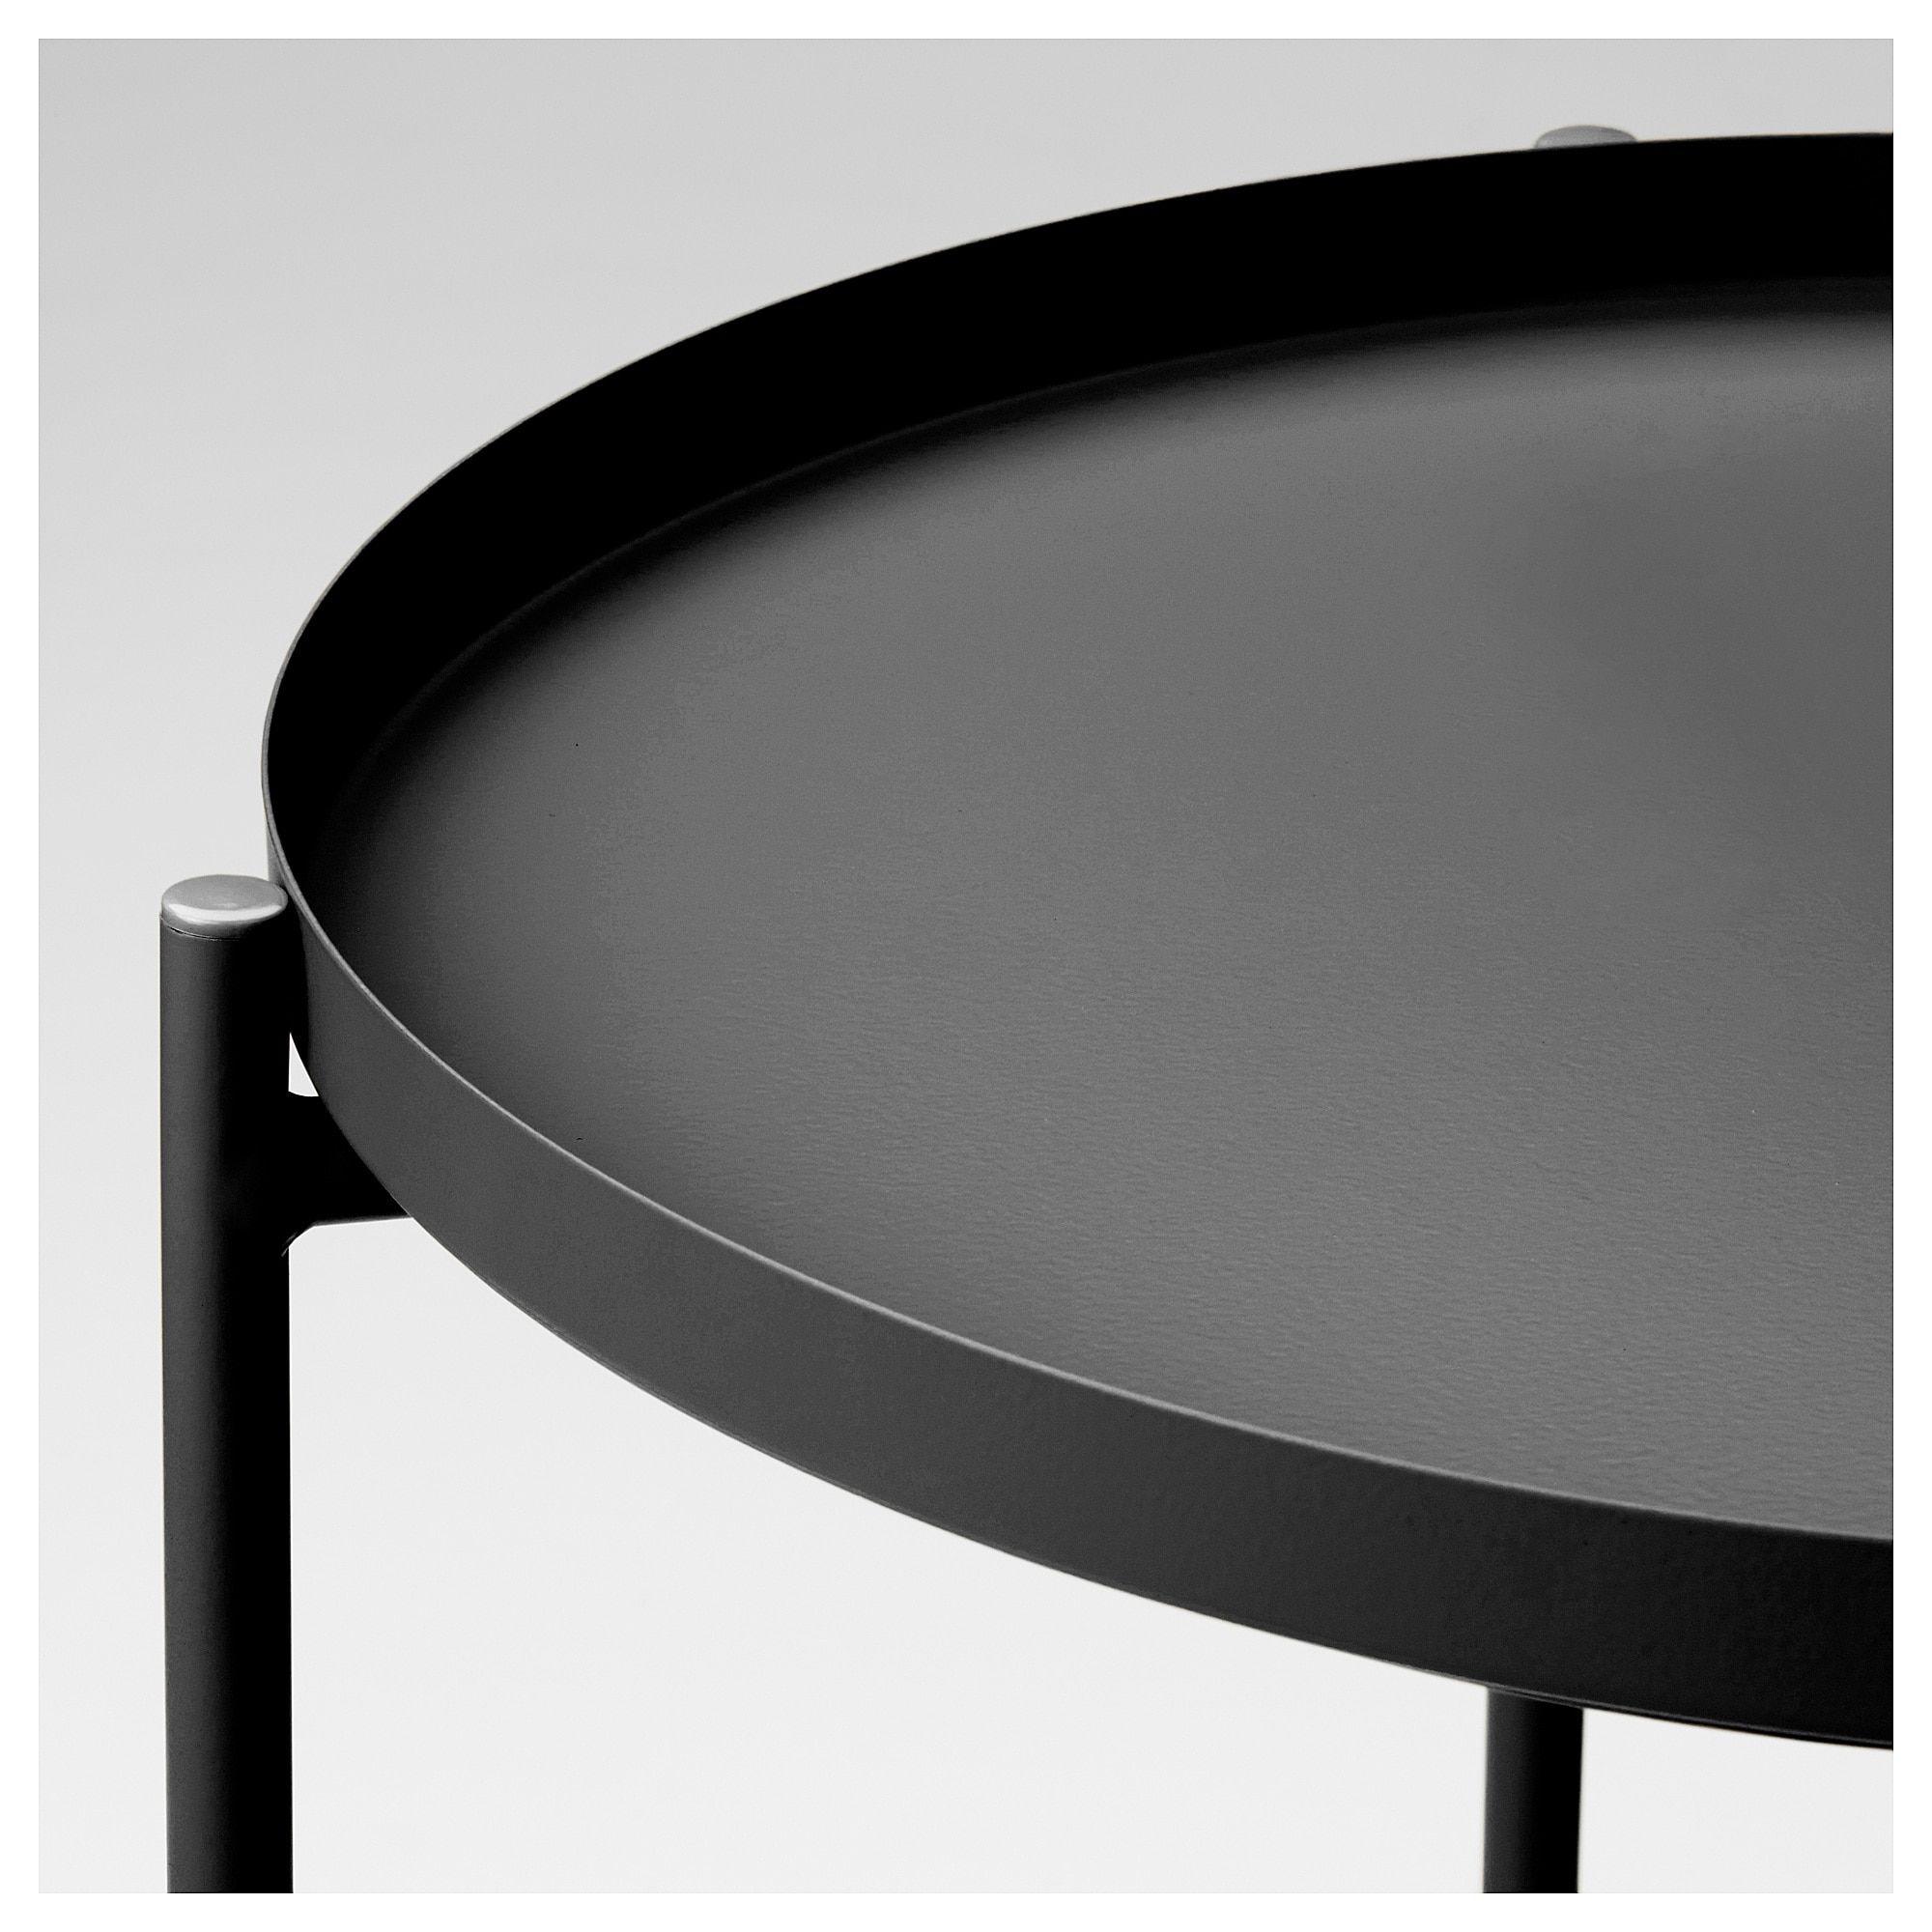 Ikea Gladom Tray Table In 2020 Round Black Coffee Table Ikea